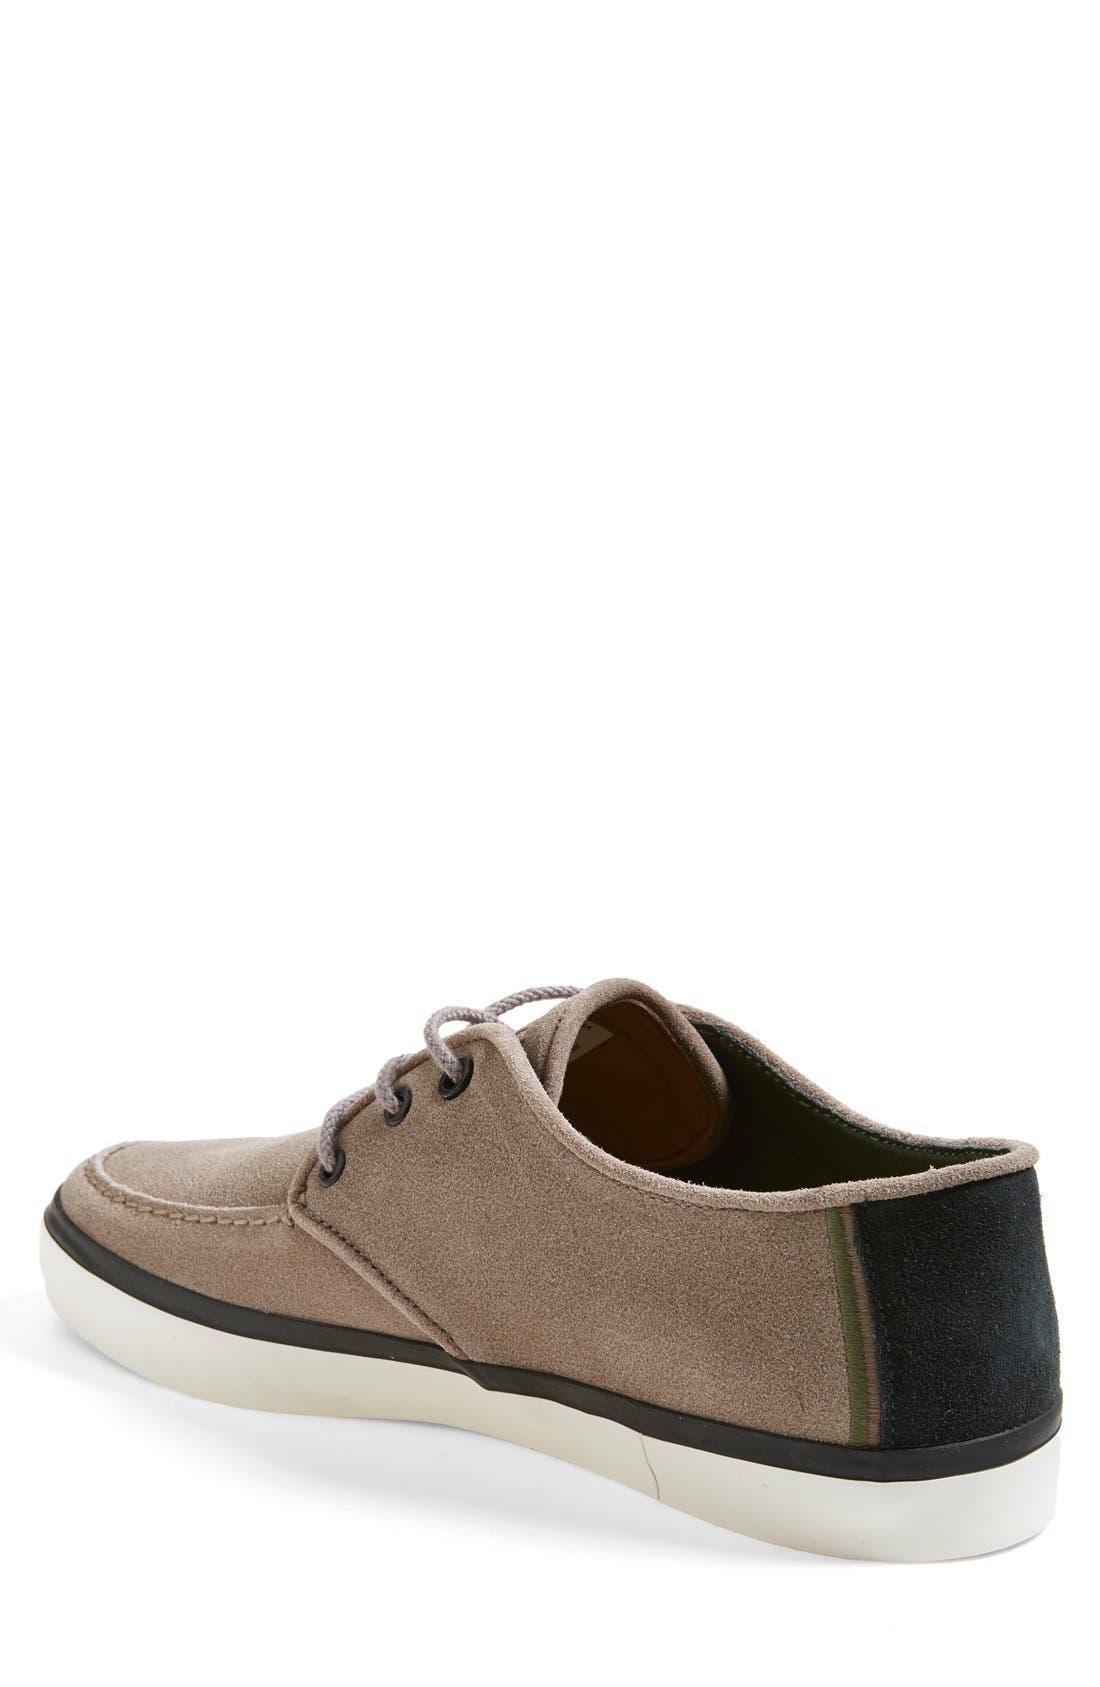 Alternate Image 2  - Lacoste 'Sevrin 4' Sneaker (Men) (Online Only)